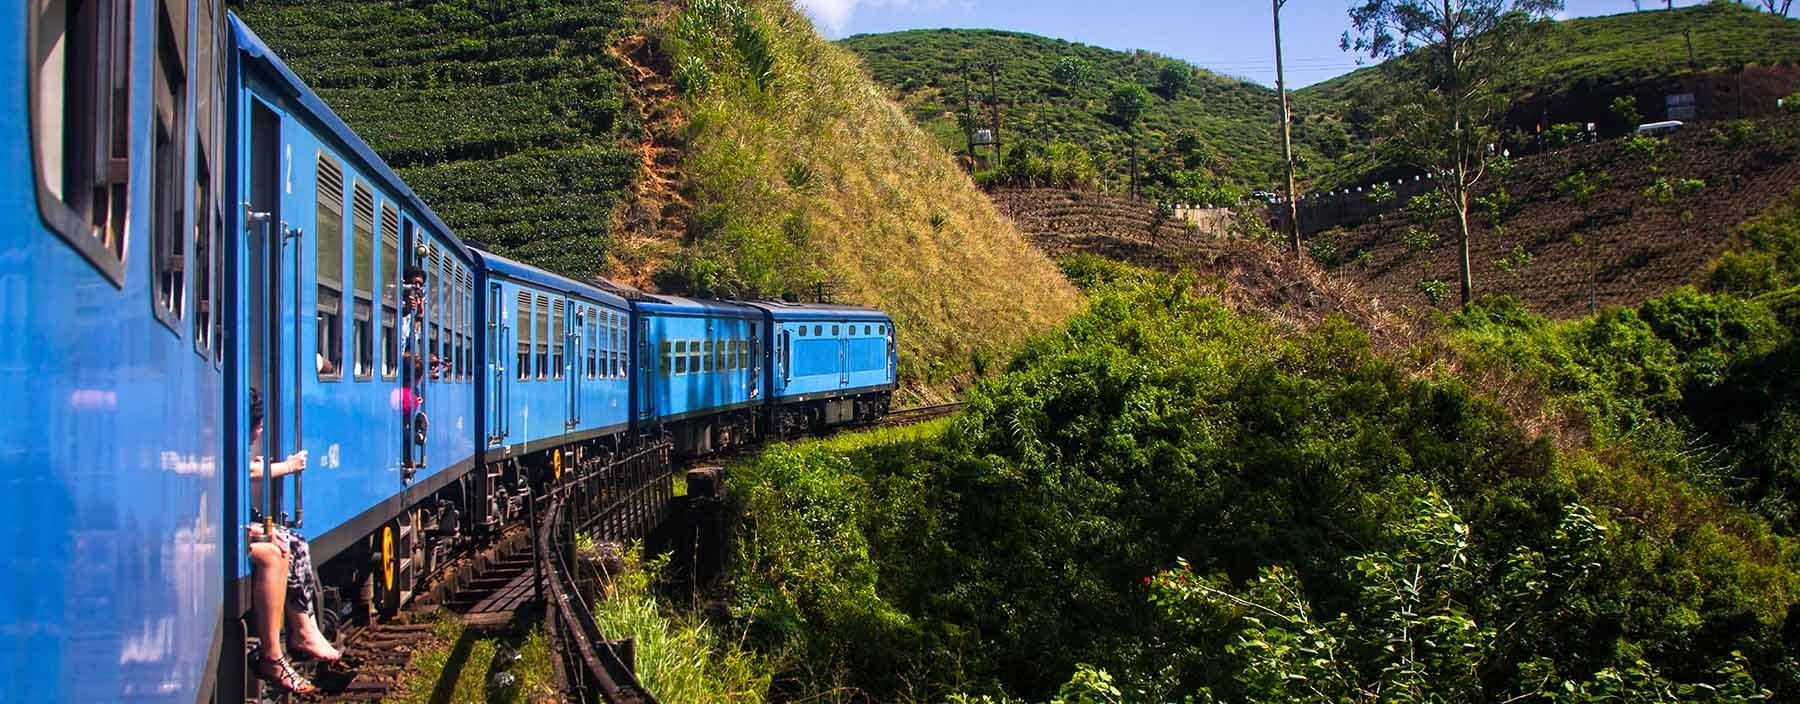 sri lanka, algemeen, trein (4).jpg